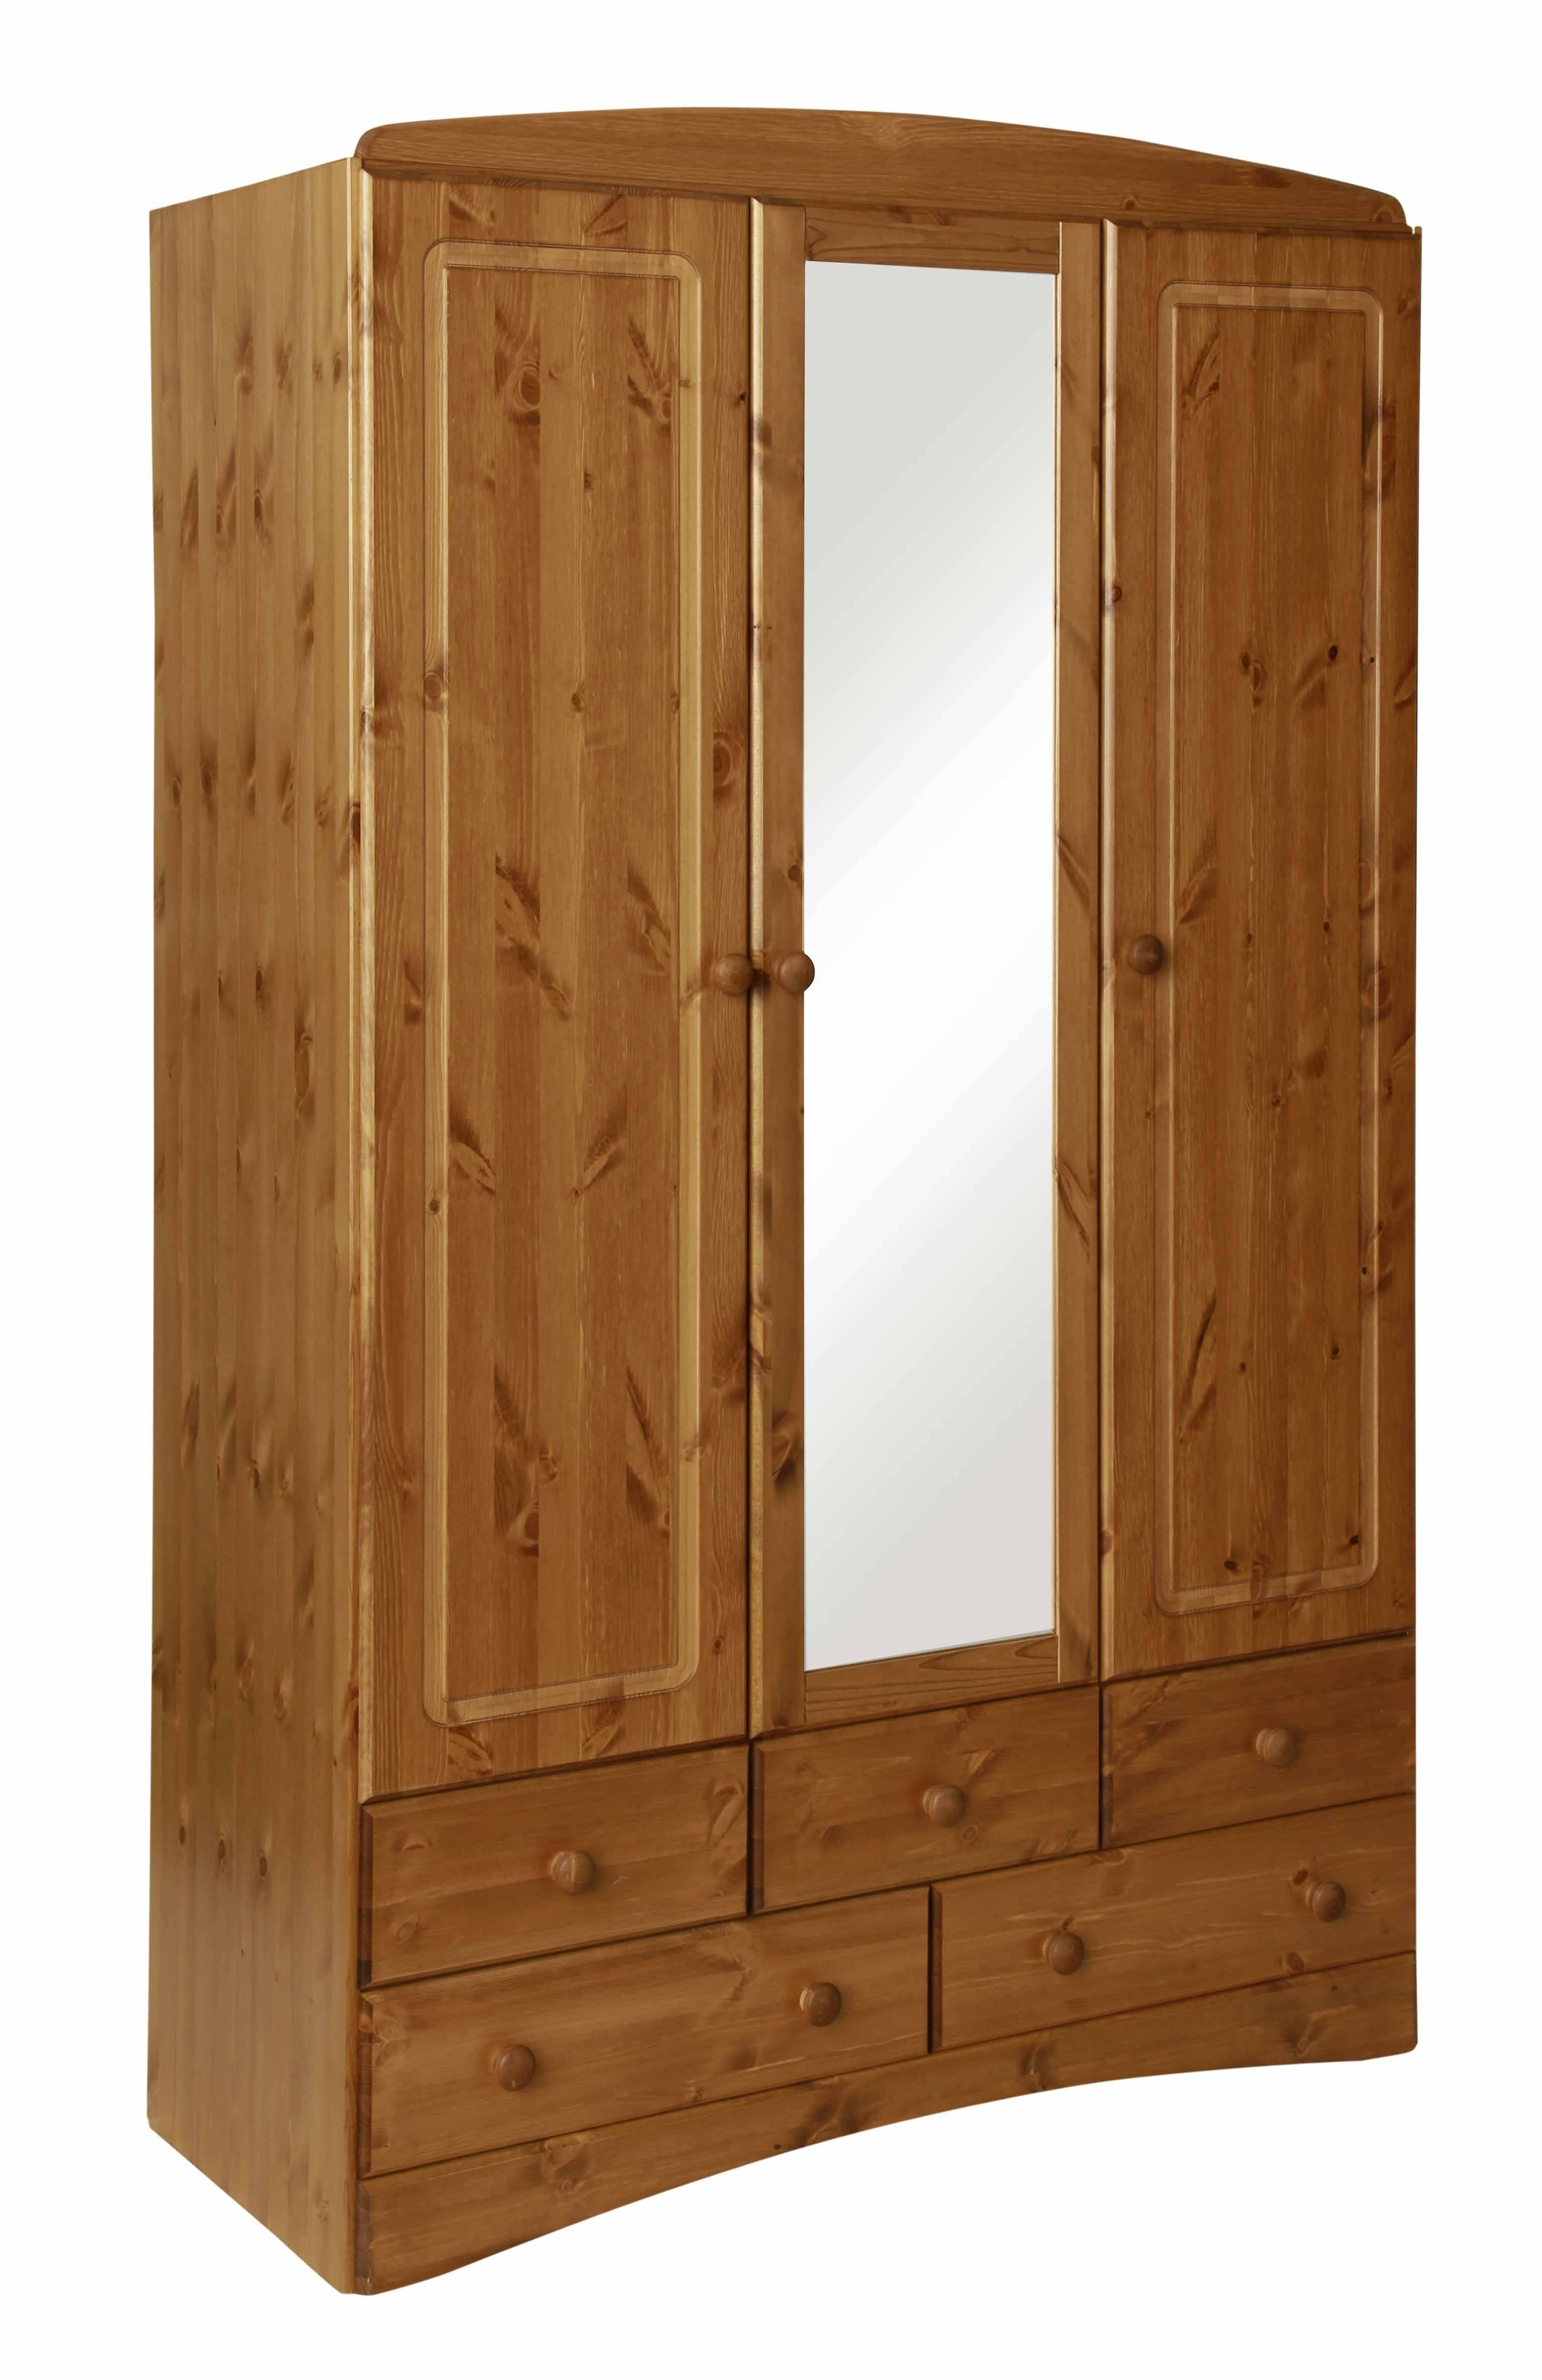 Scandi Pine 3 Door 5 Drawer Wardrobe With Mirror with 3 Door Pine Wardrobes (Image 13 of 15)